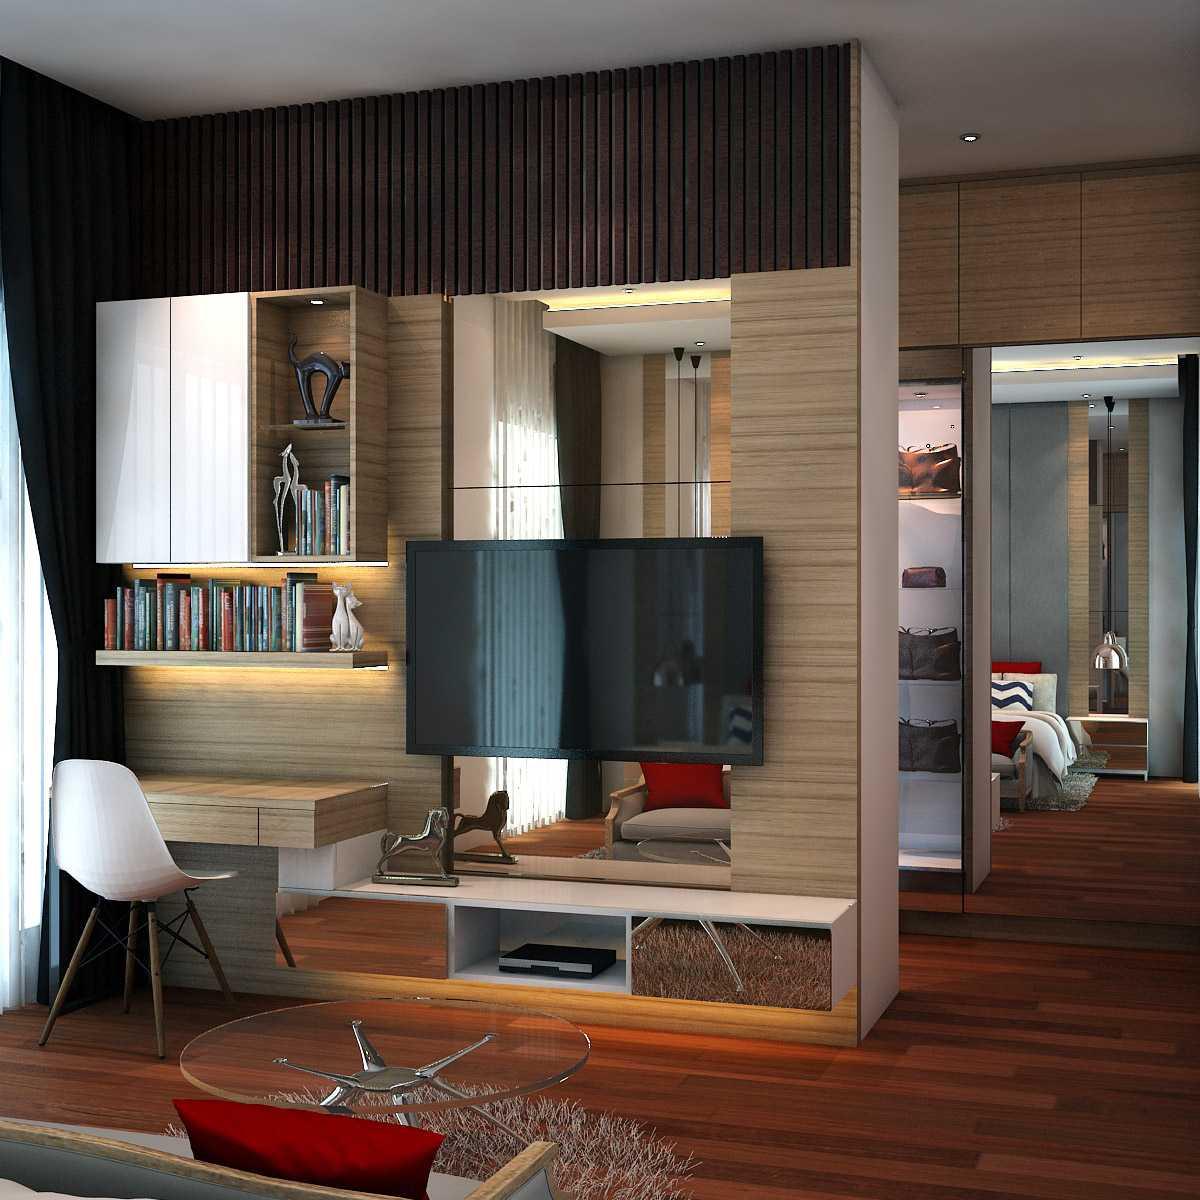 Aditya Wira Hardi Modern Master Bedroom, Medokan Surabaya Surabaya, Kota Sby, Jawa Timur, Indonesia Surabaya, Kota Sby, Jawa Timur, Indonesia Aditya-Wira-Hardi-Modern-Master-Bedroom-Medokan-Surabaya   65946